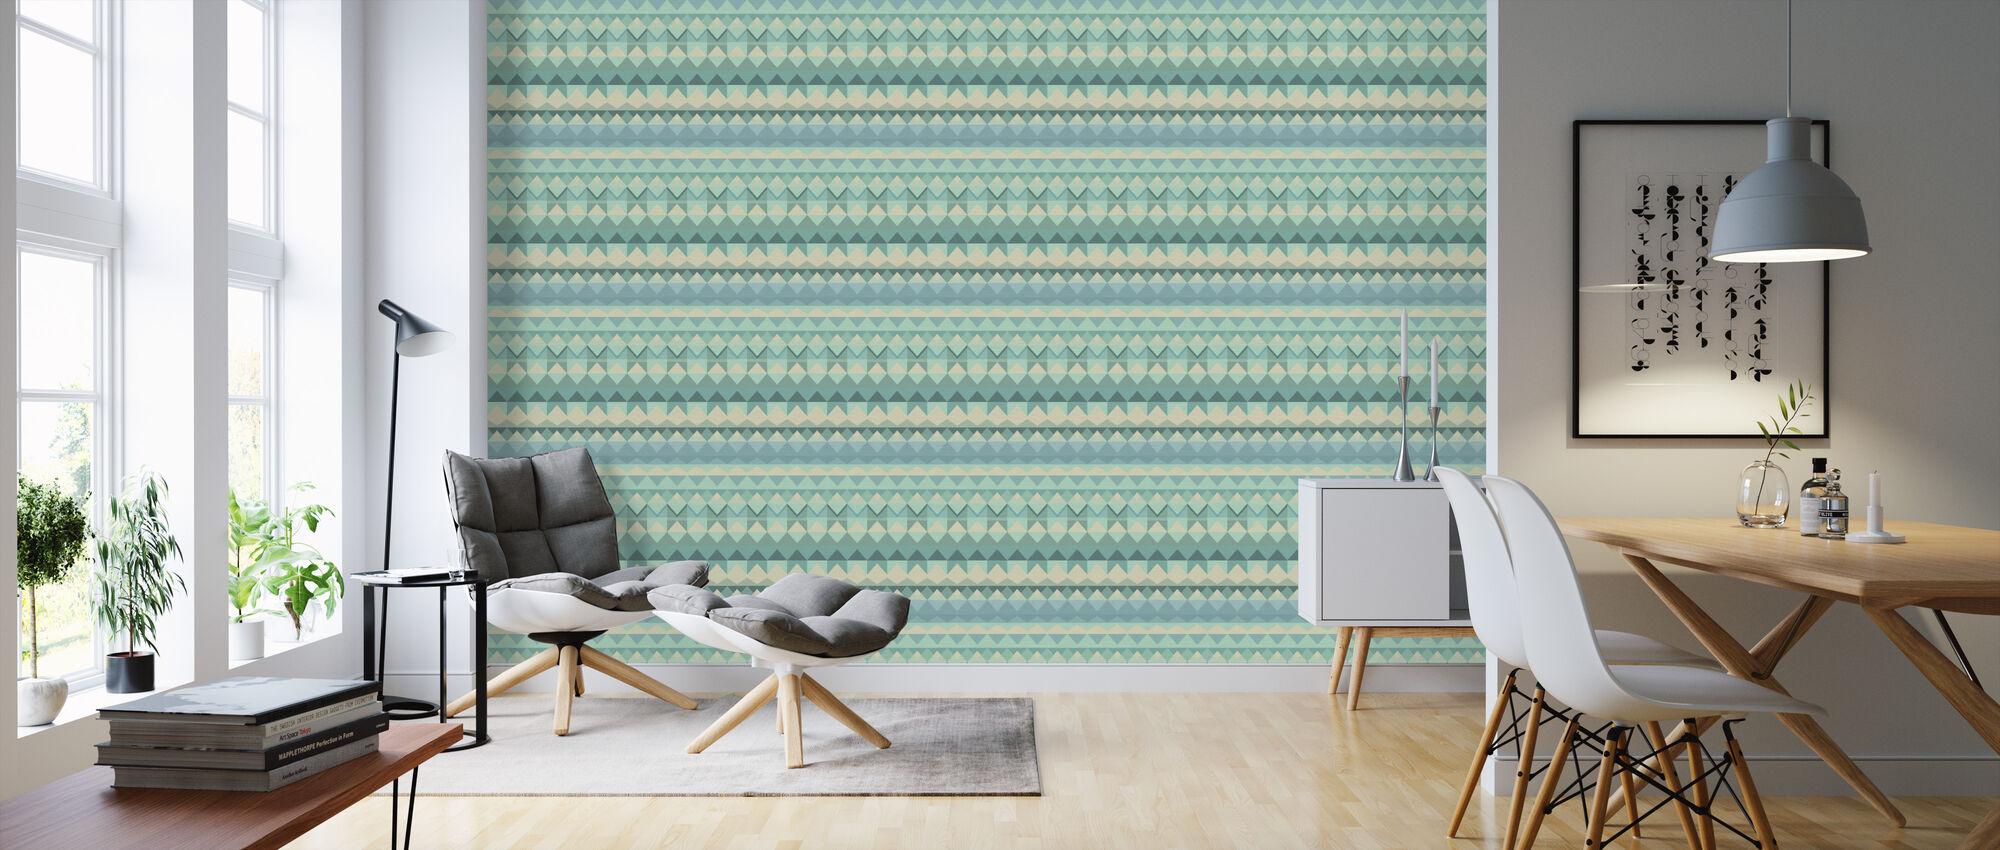 Weave Mint - Wallpaper - Living Room